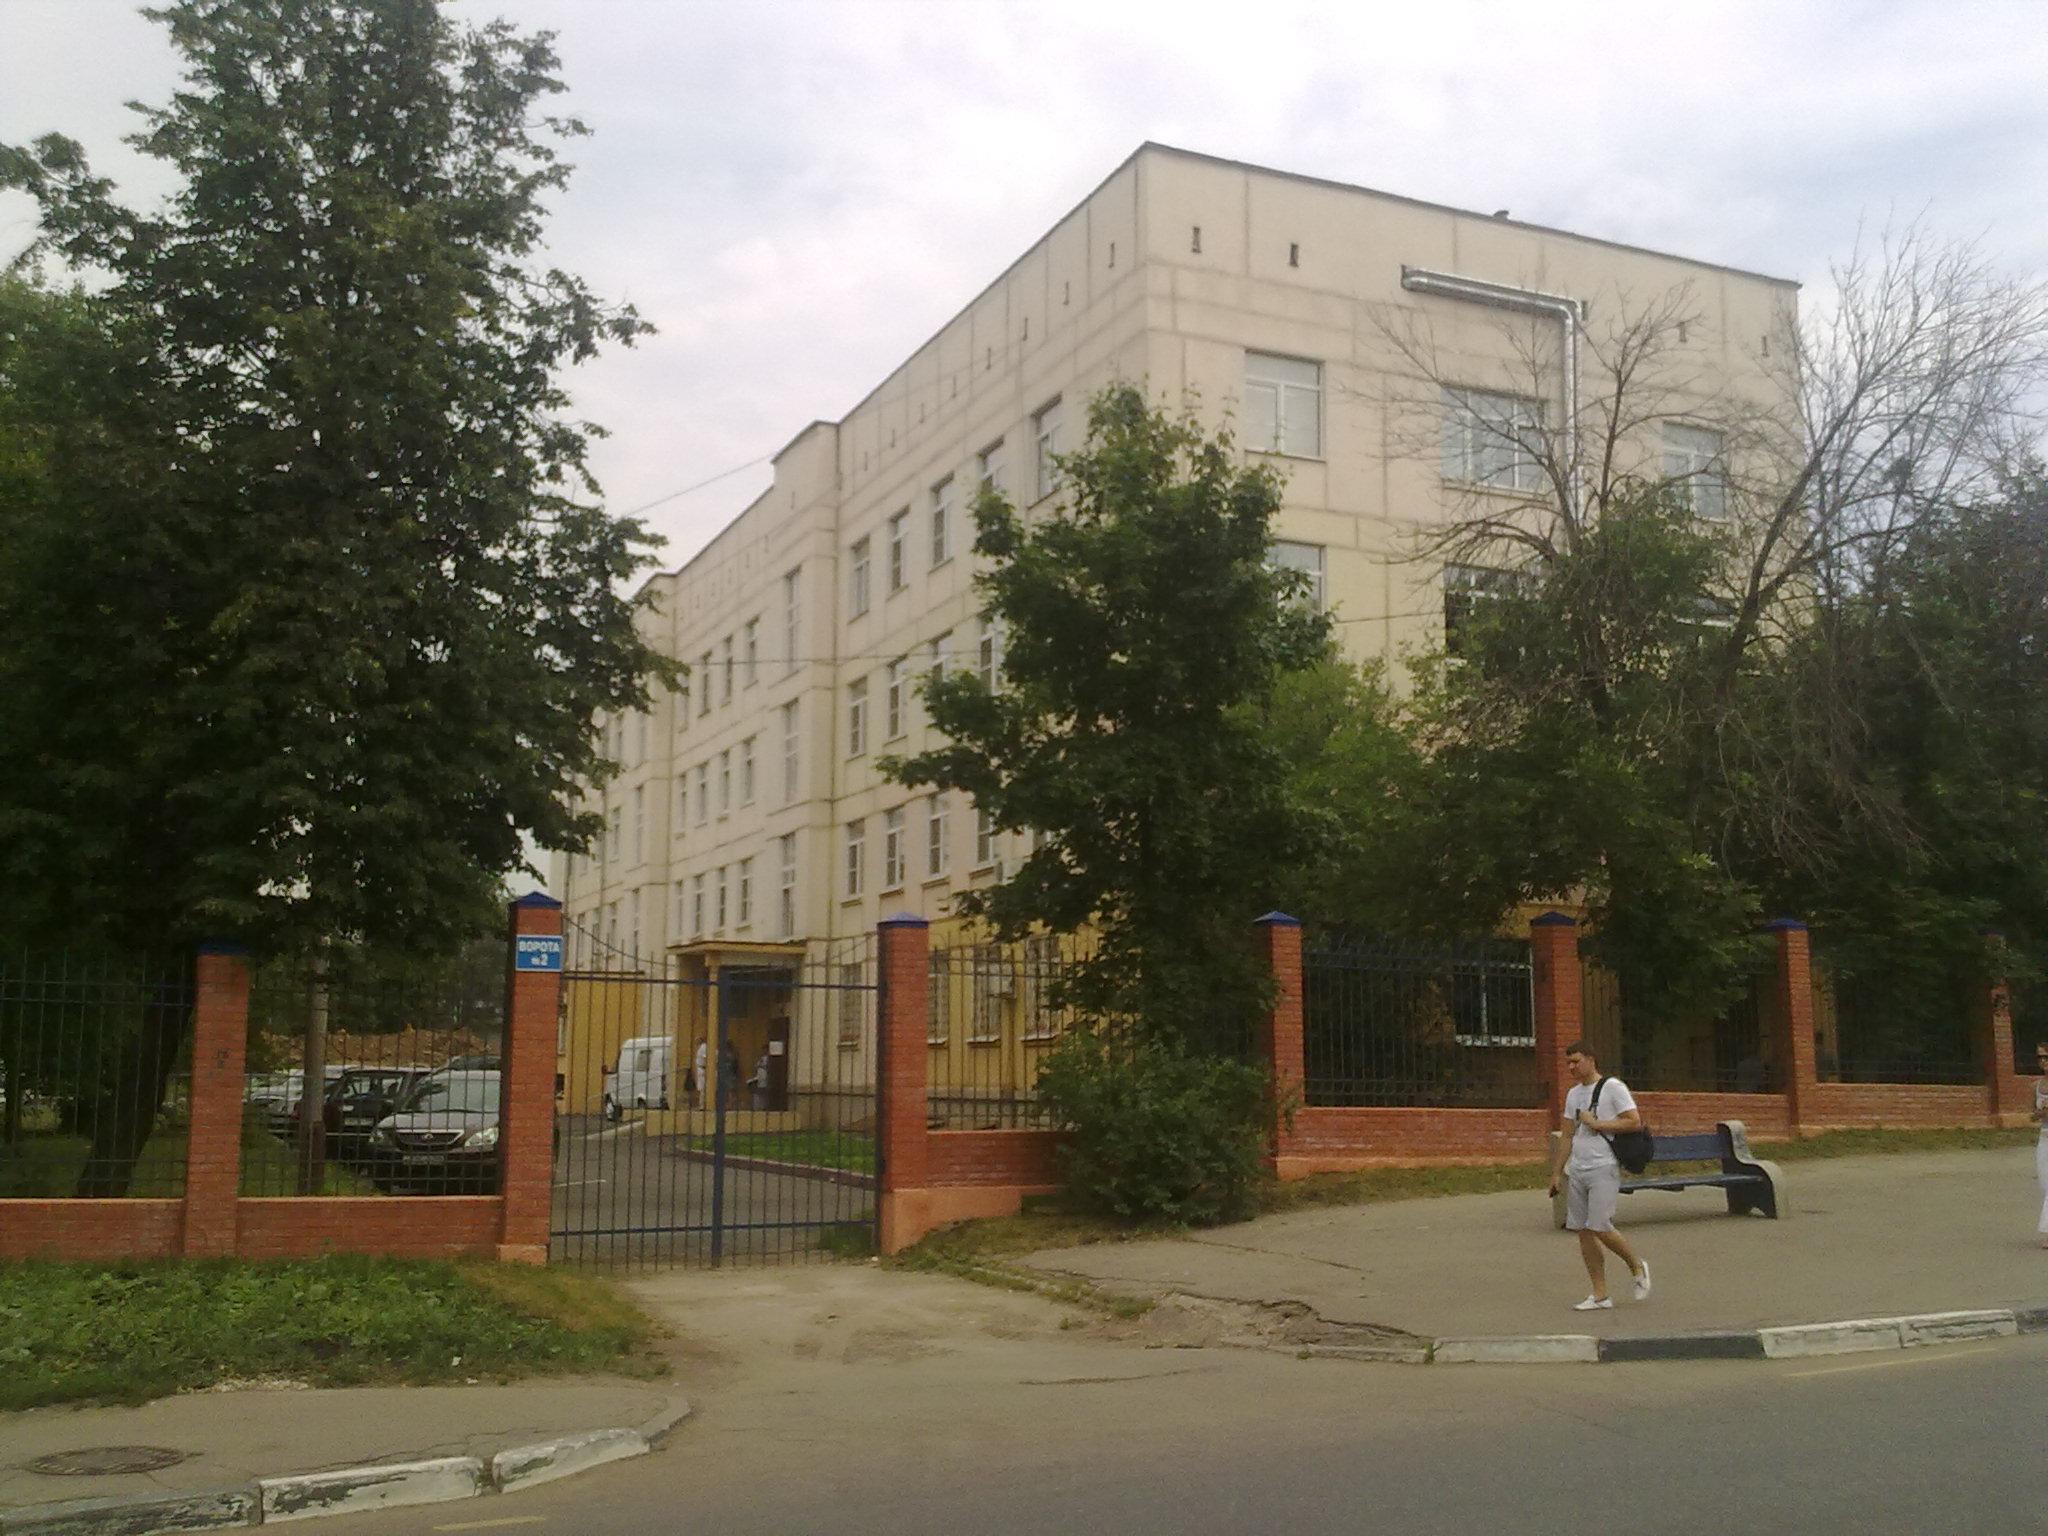 0). Поликлиники.  Поликлиника САО при больнице 81.  Москва, Лобненская улица, 10.